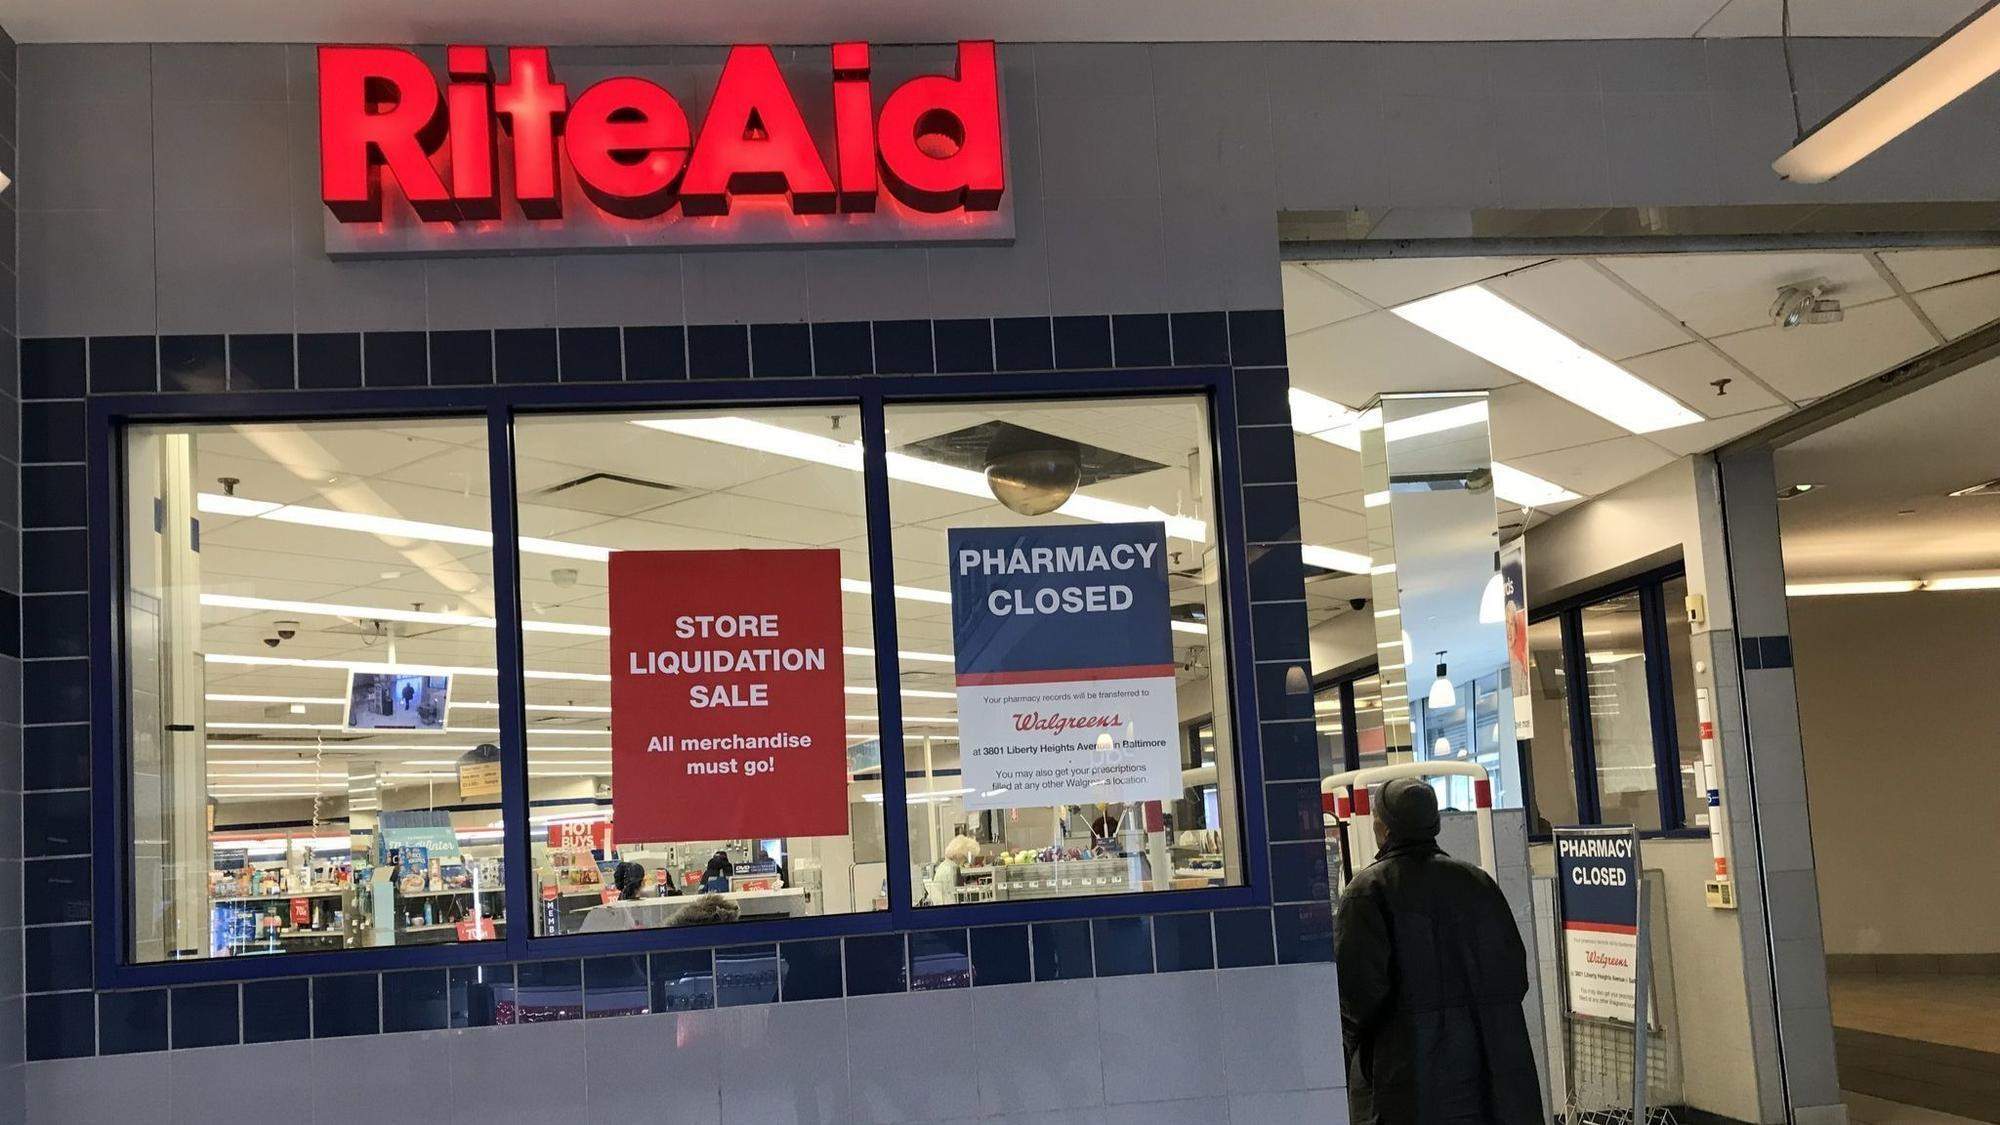 b381e4e696 Rite Aid at Mondawmin Mall is closing - Baltimore Sun